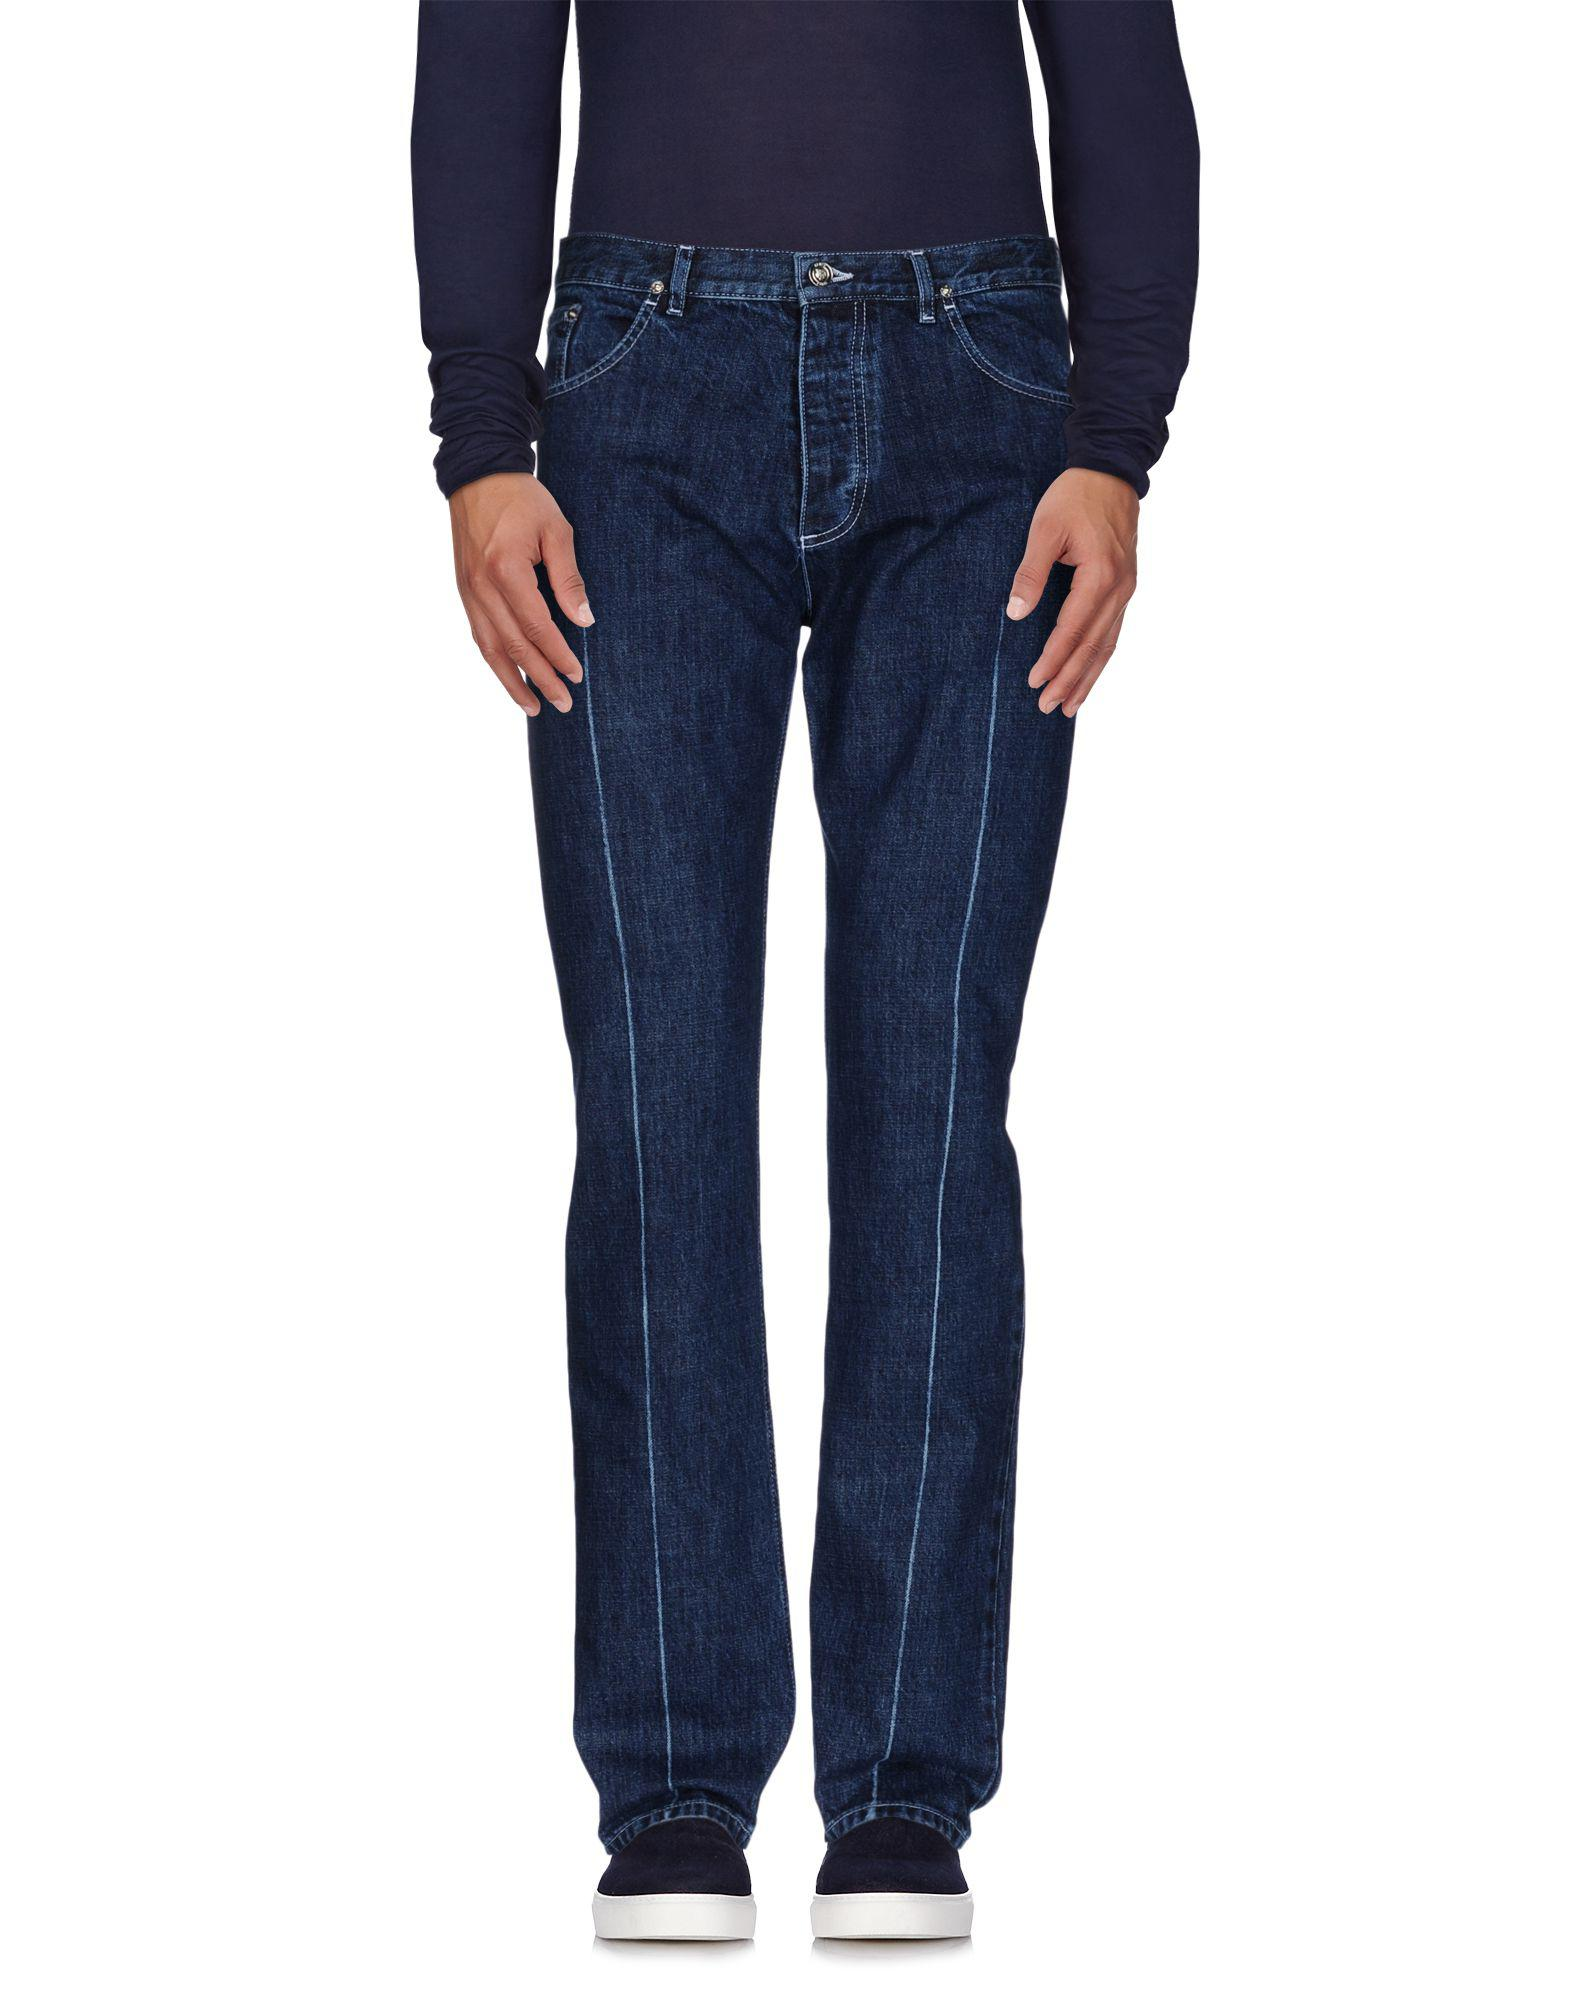 aa1daabfc Men's Blue Denim Pants